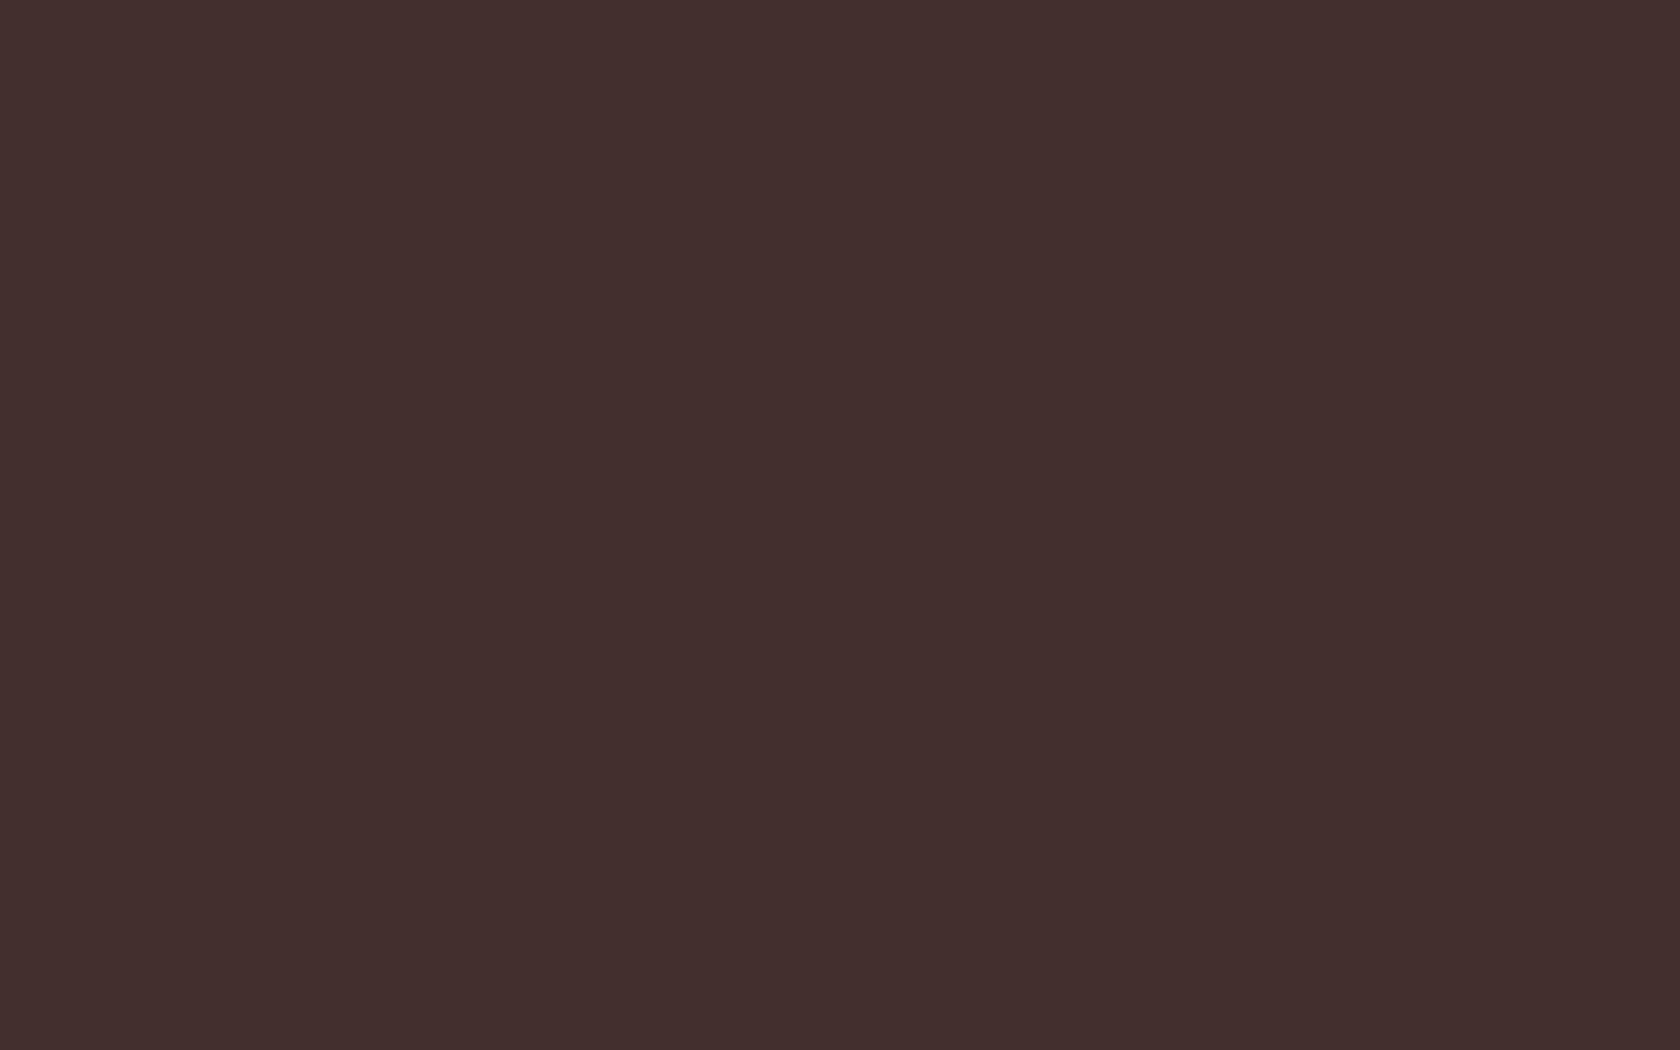 1680x1050 Old Burgundy Solid Color Background